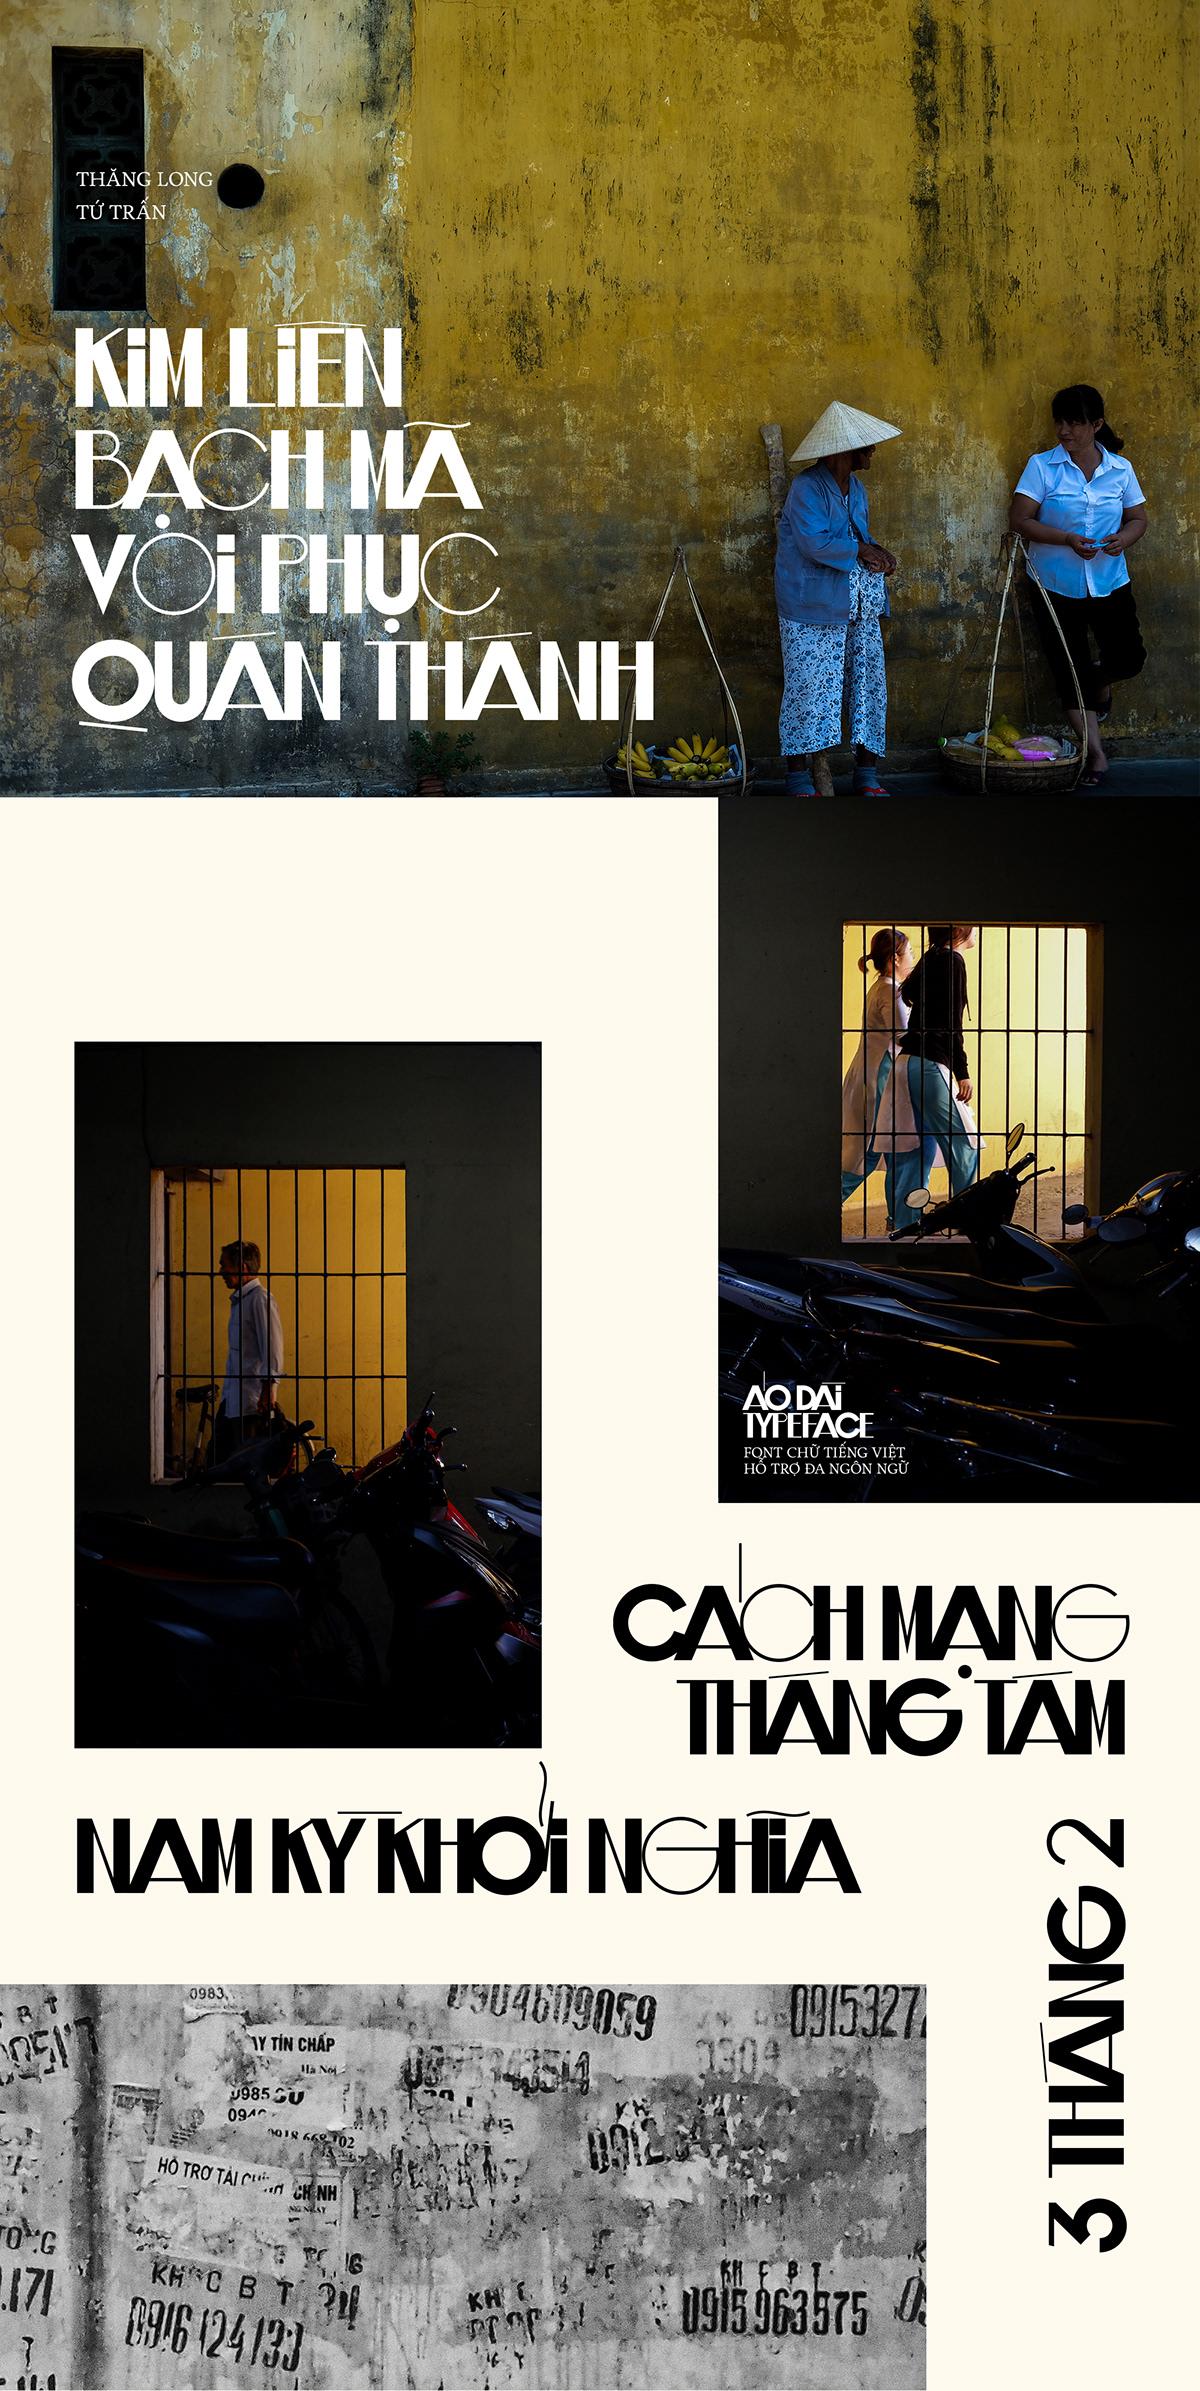 font Free font vietnam vietnamese font font tiếng việt hanoi manh nguyen feminine exquisite